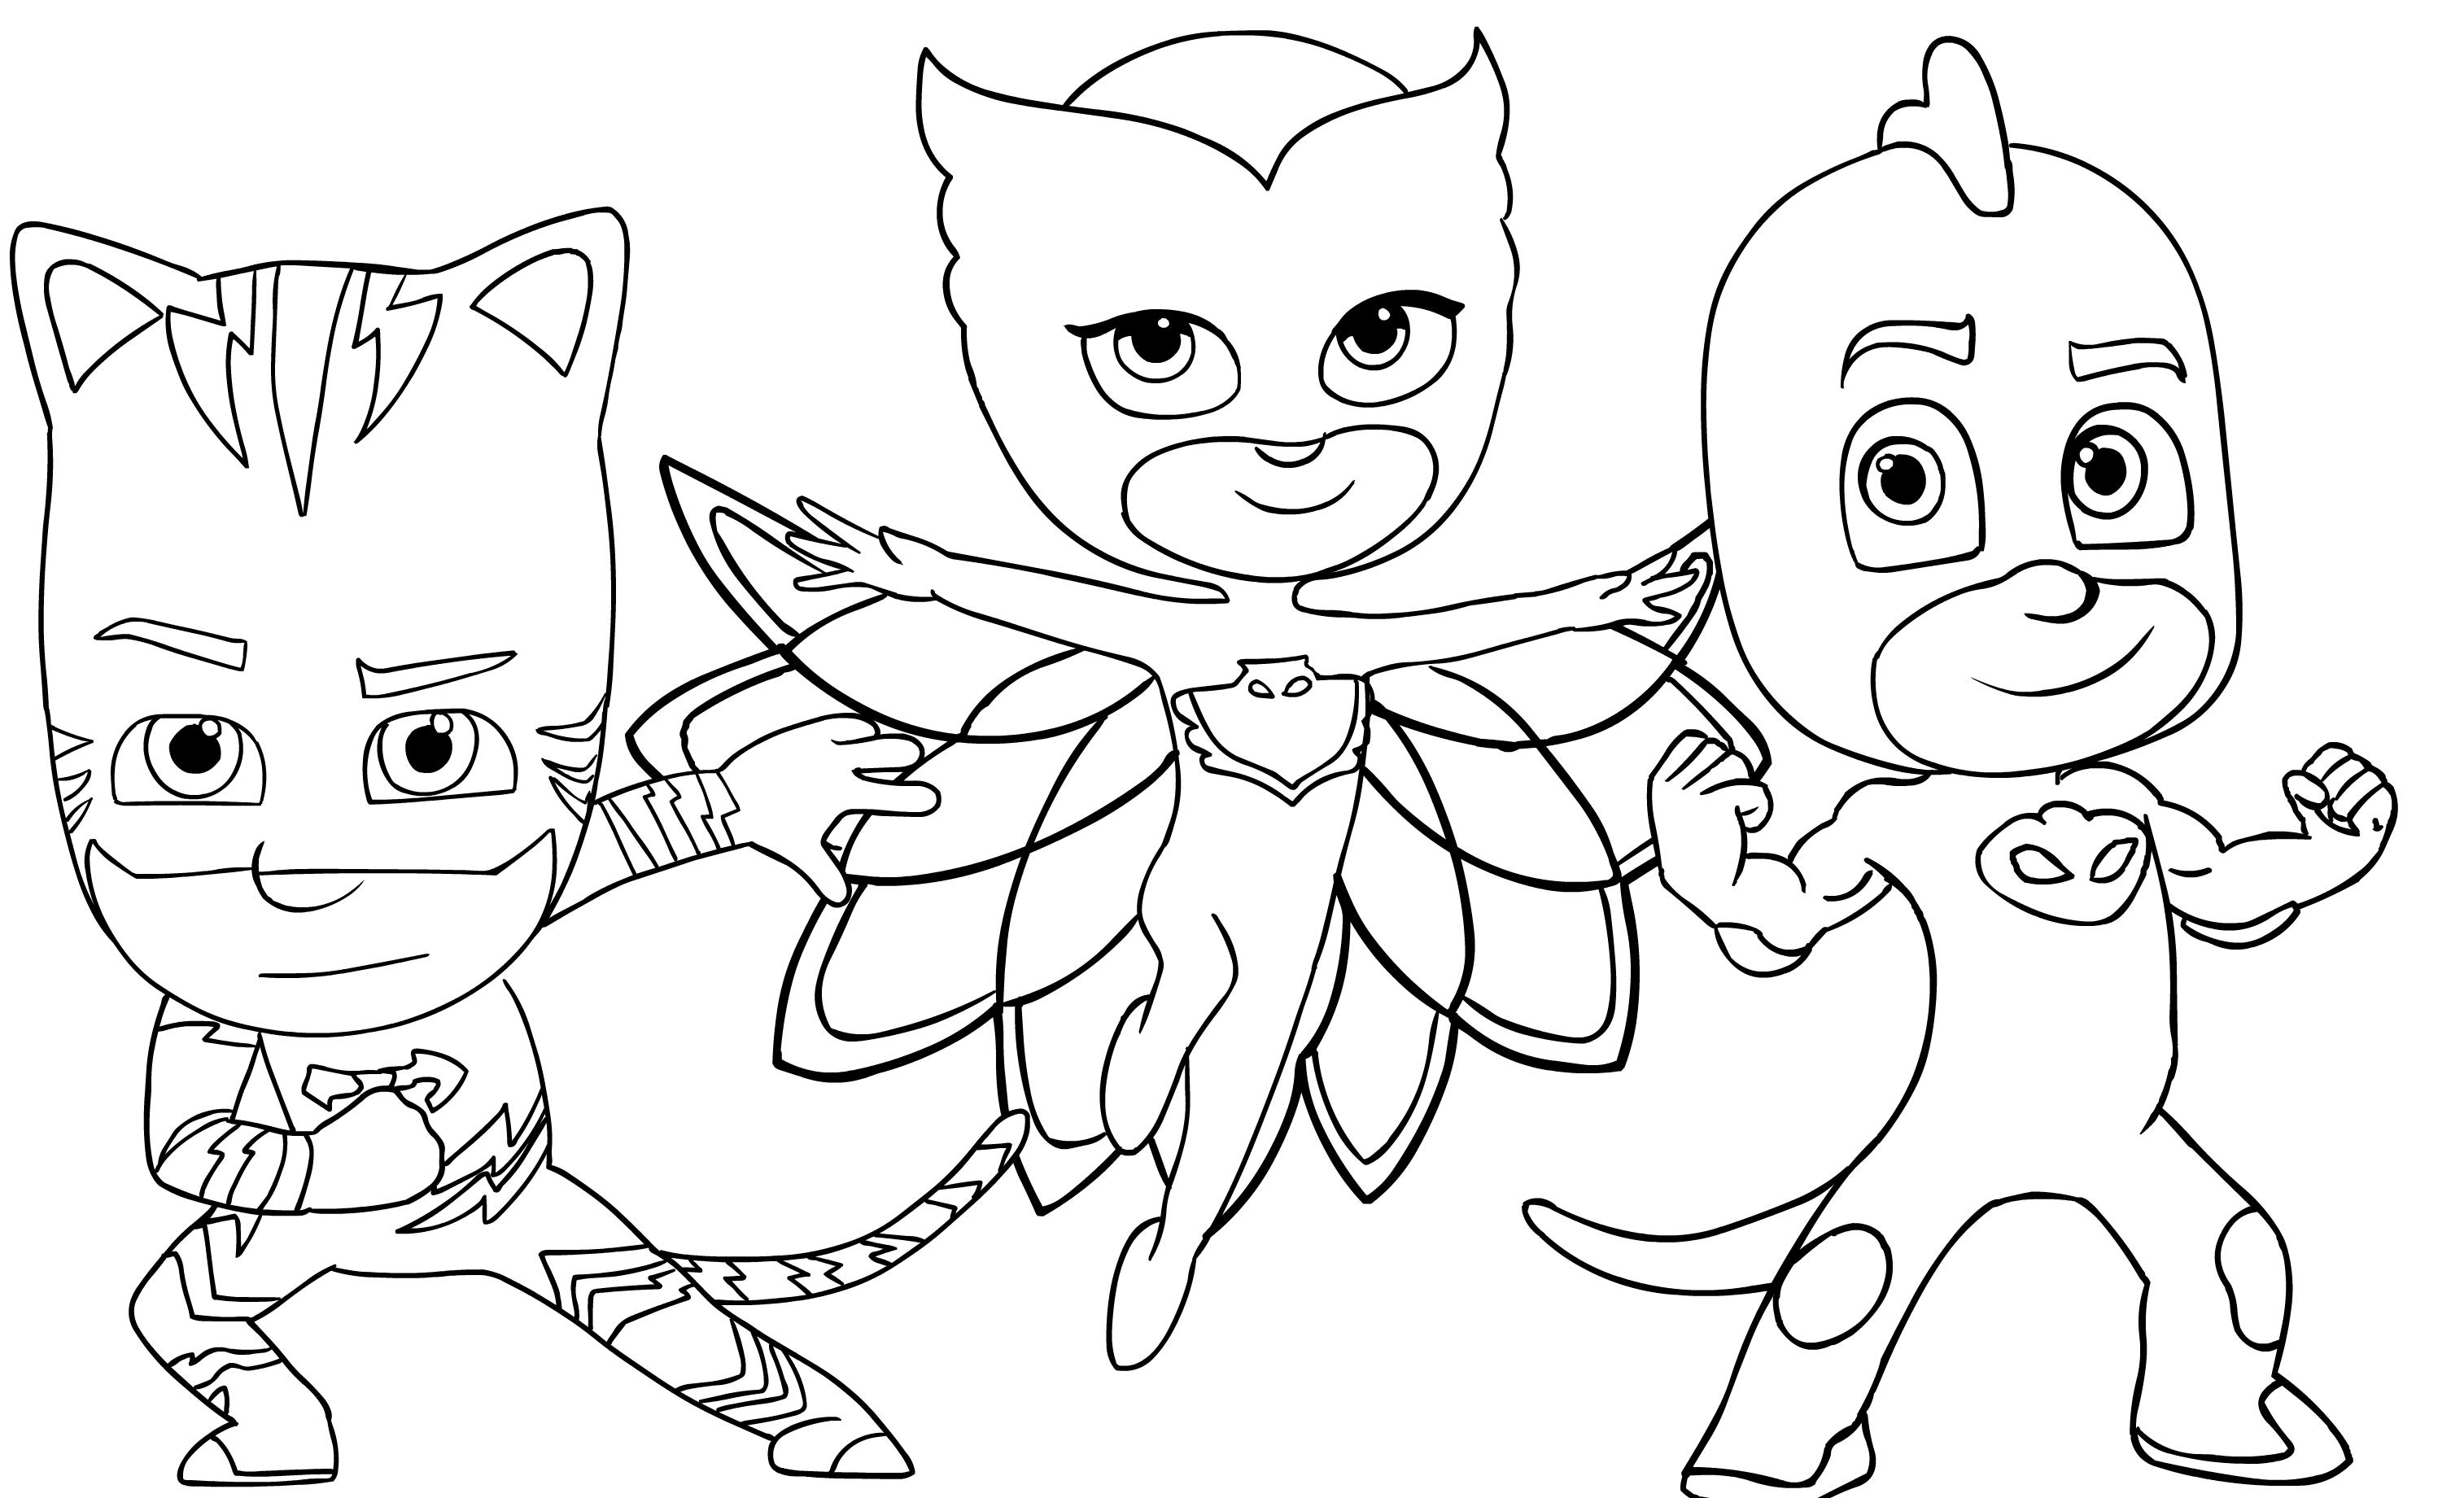 Dibujo 5 De Pj Masks Para Colorear